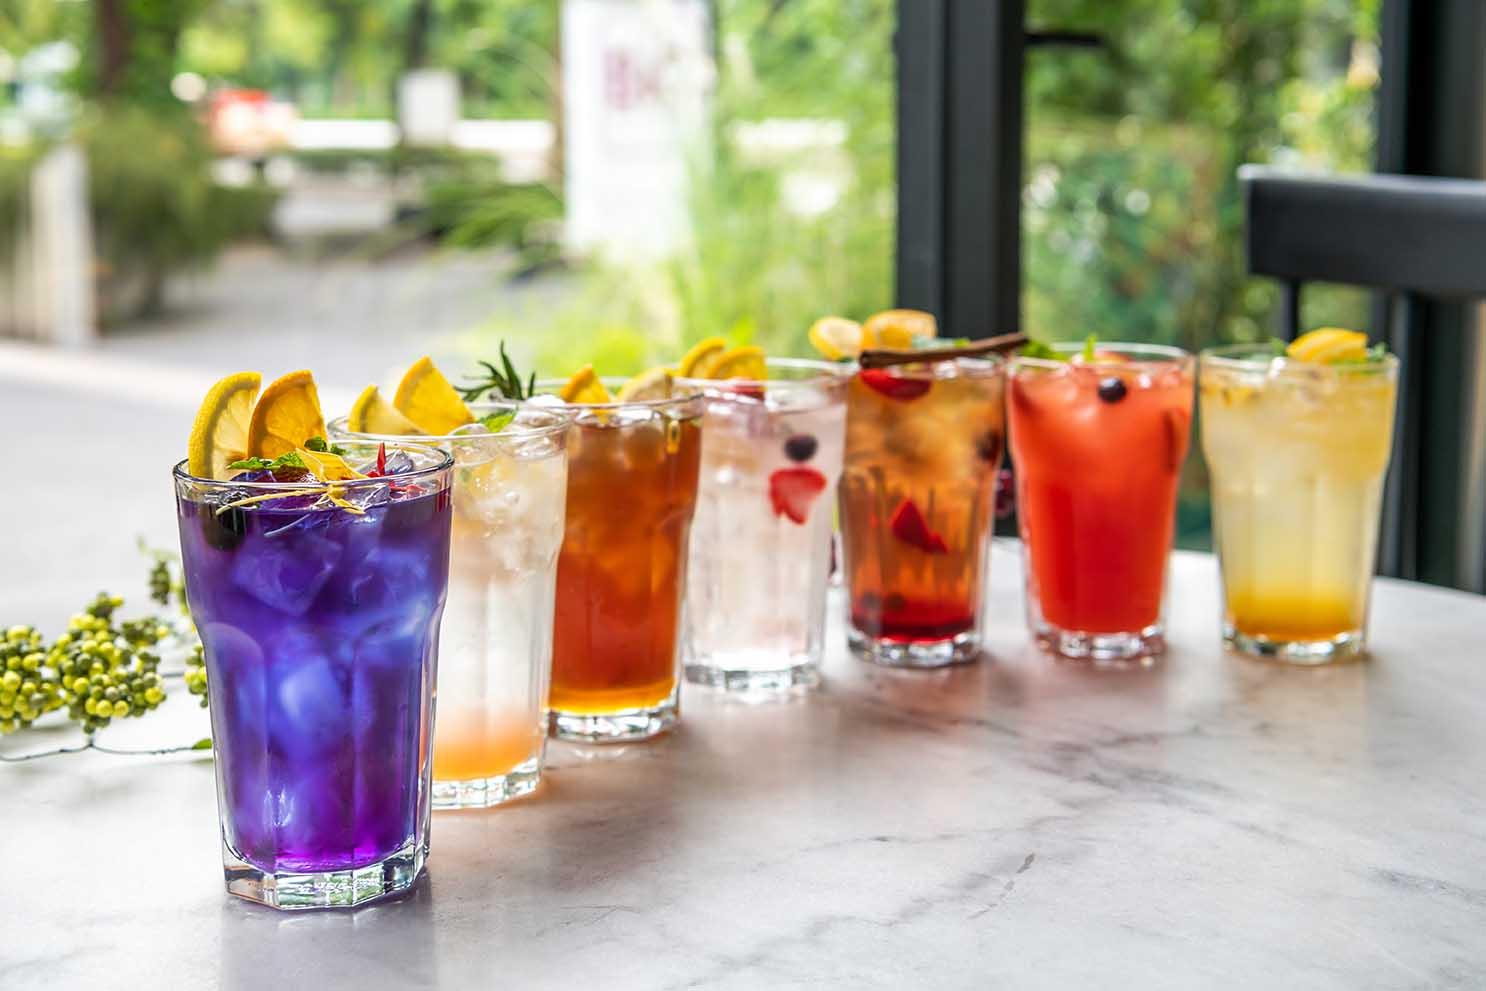 Lineup of HOmemade Soda